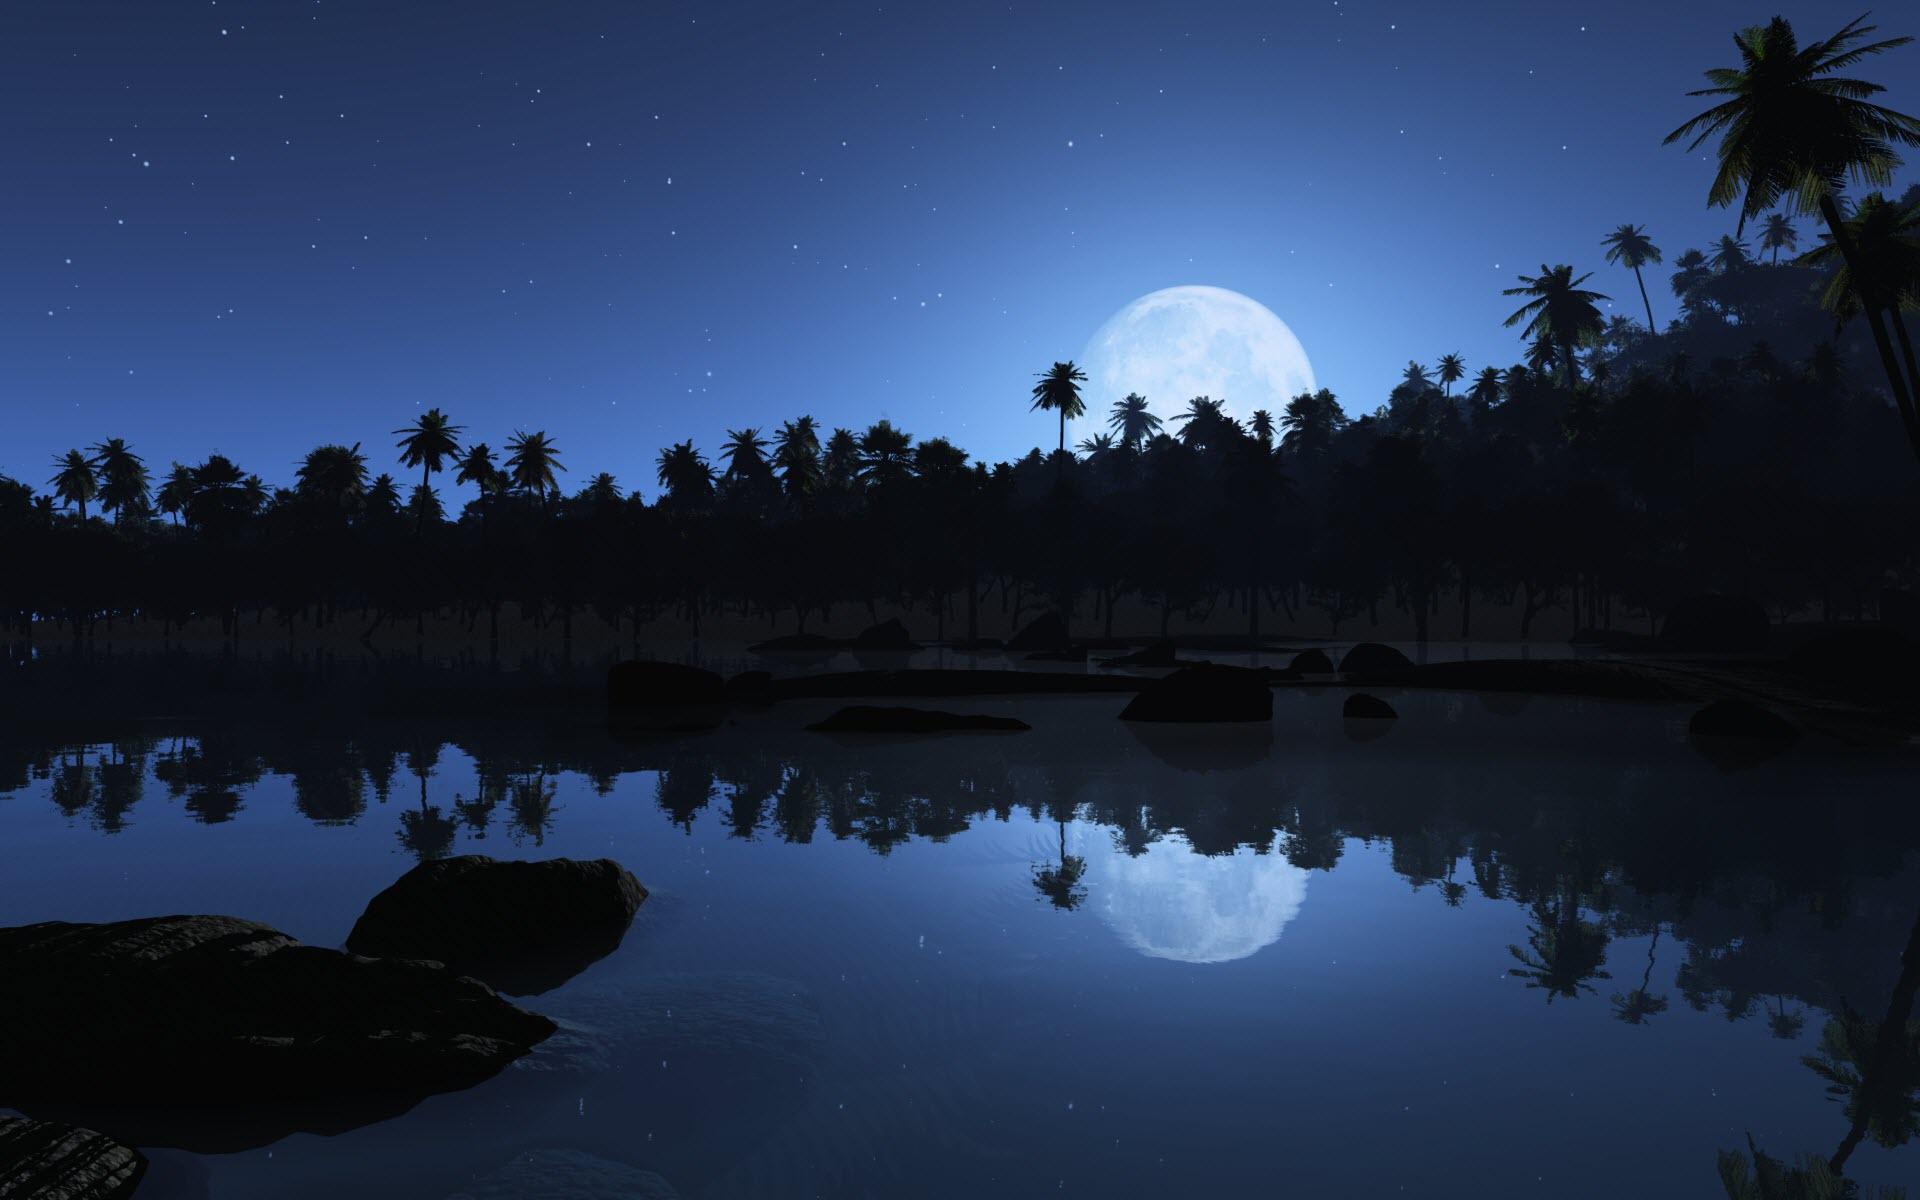 Wallpaper download night - Aqua Blue Night Wallpapers Hd Wallpapers